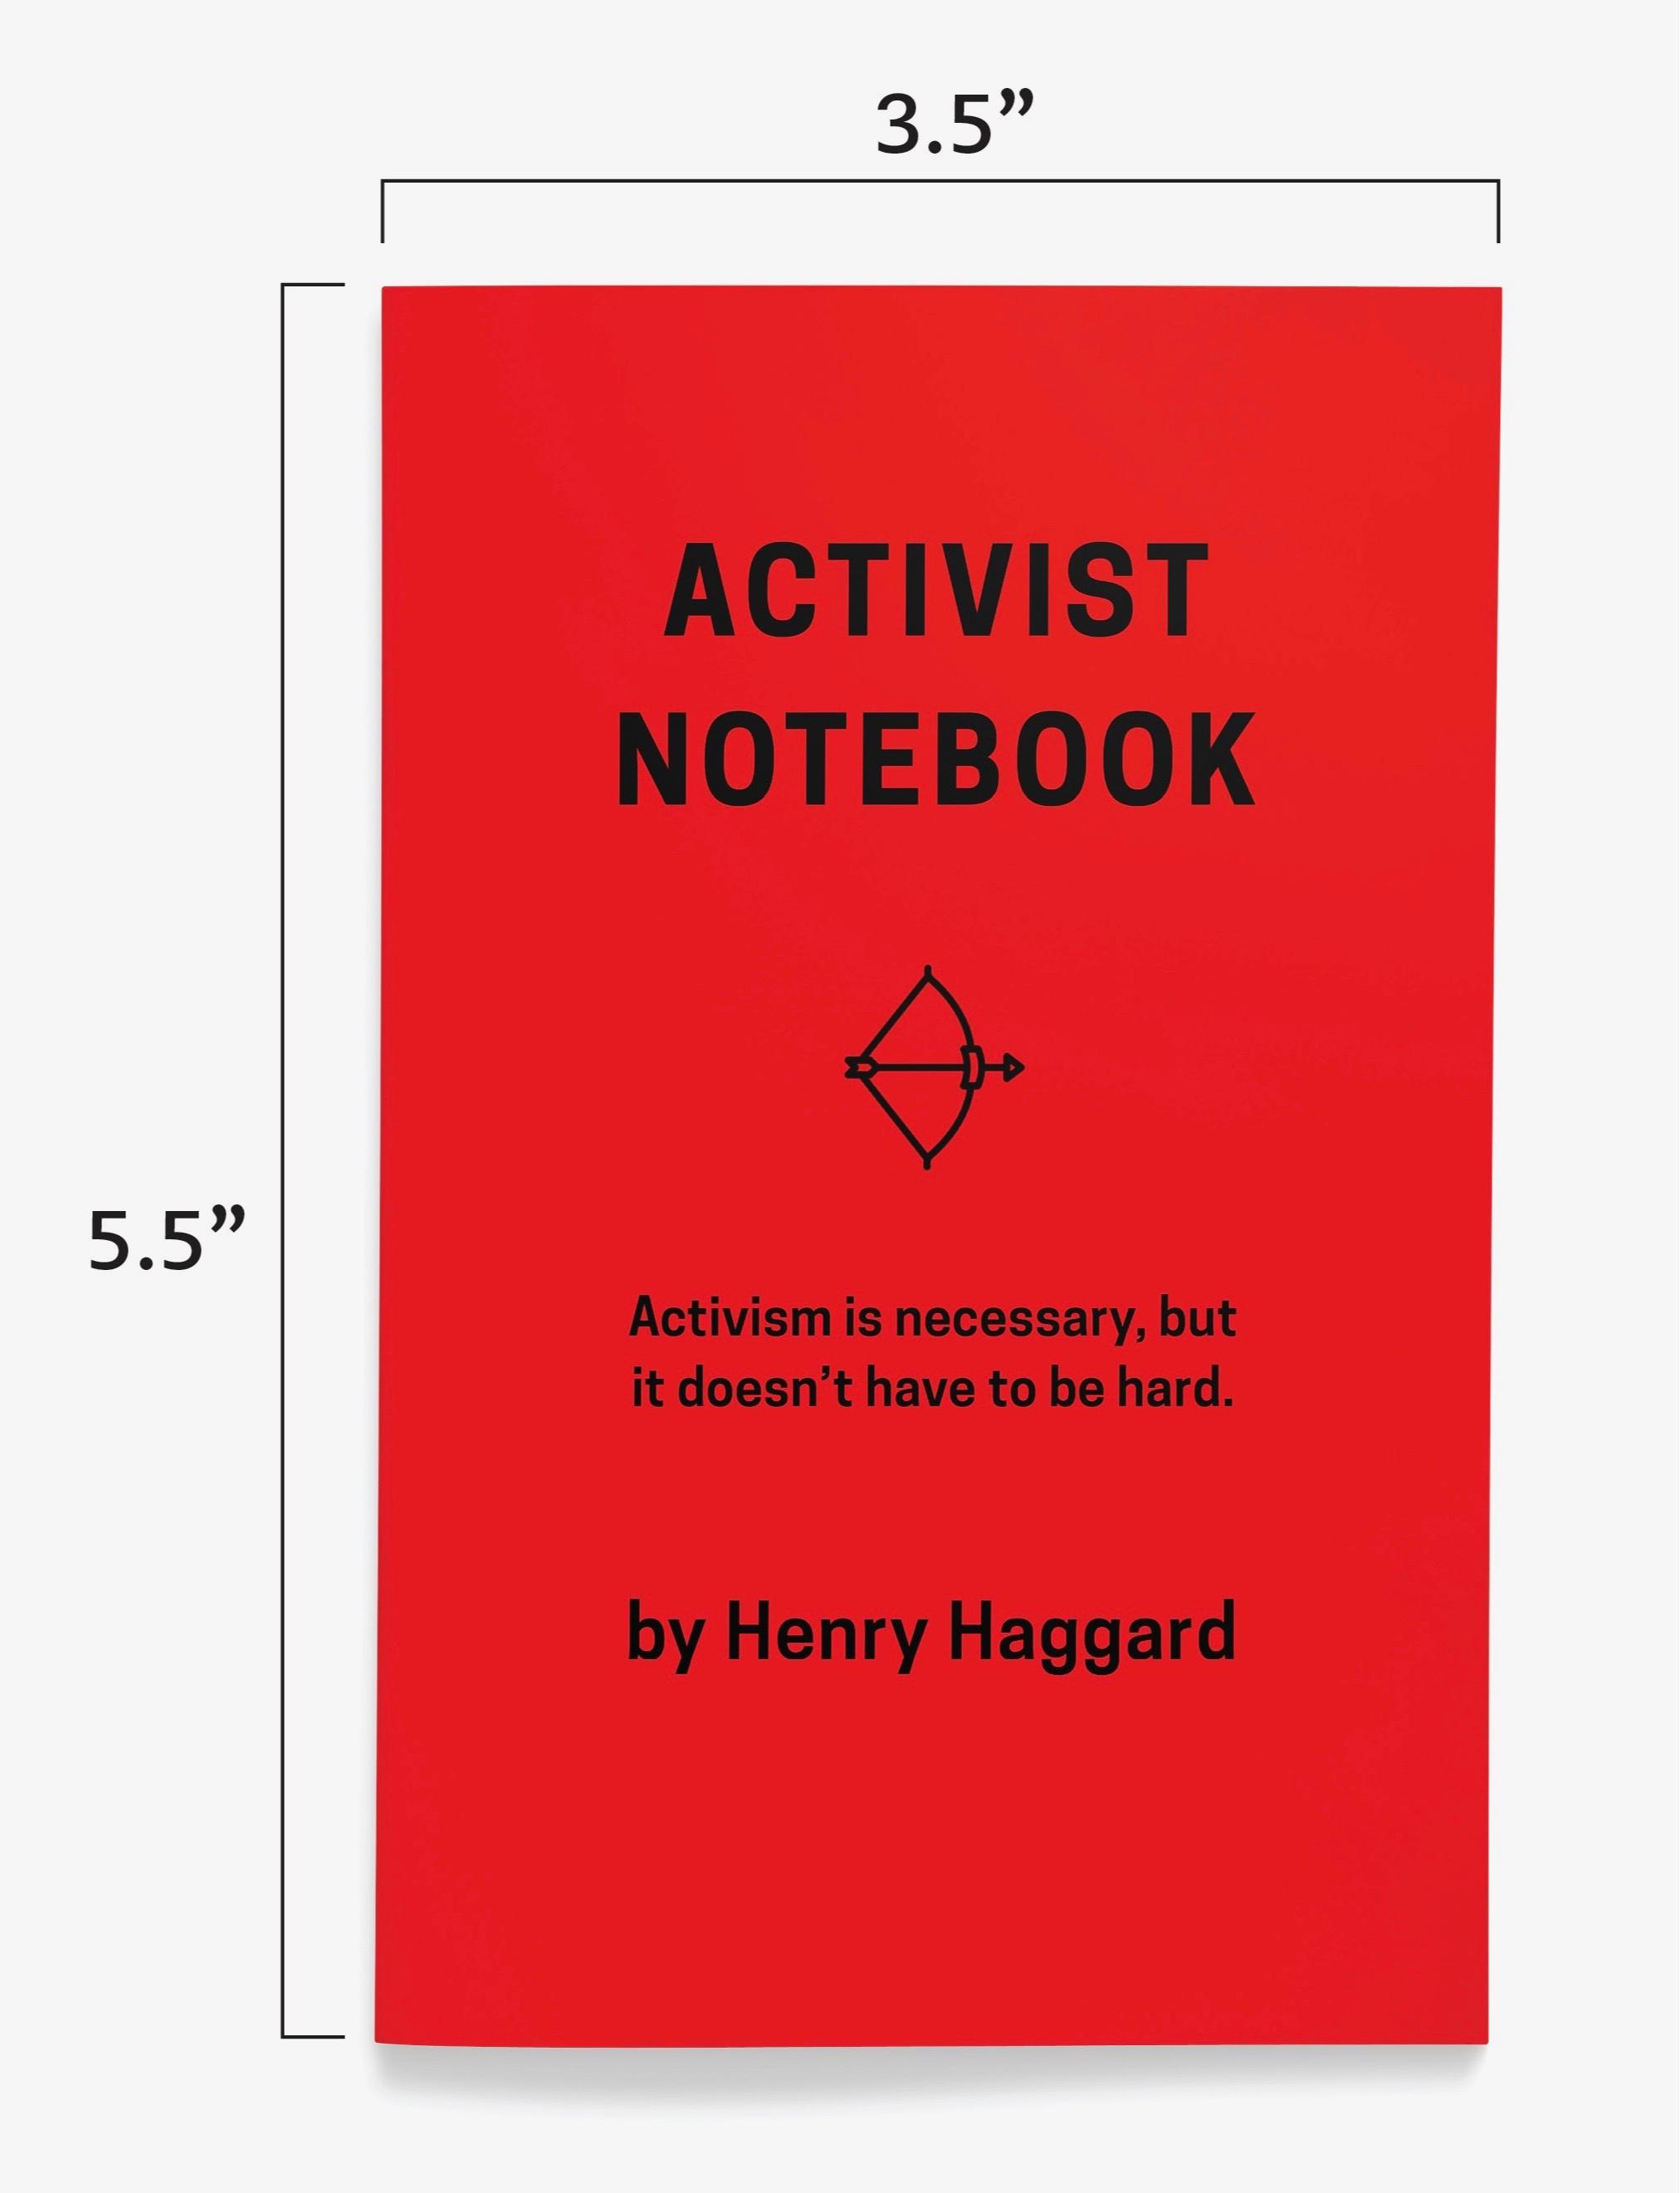 ActivistNotebook_measurements.jpg